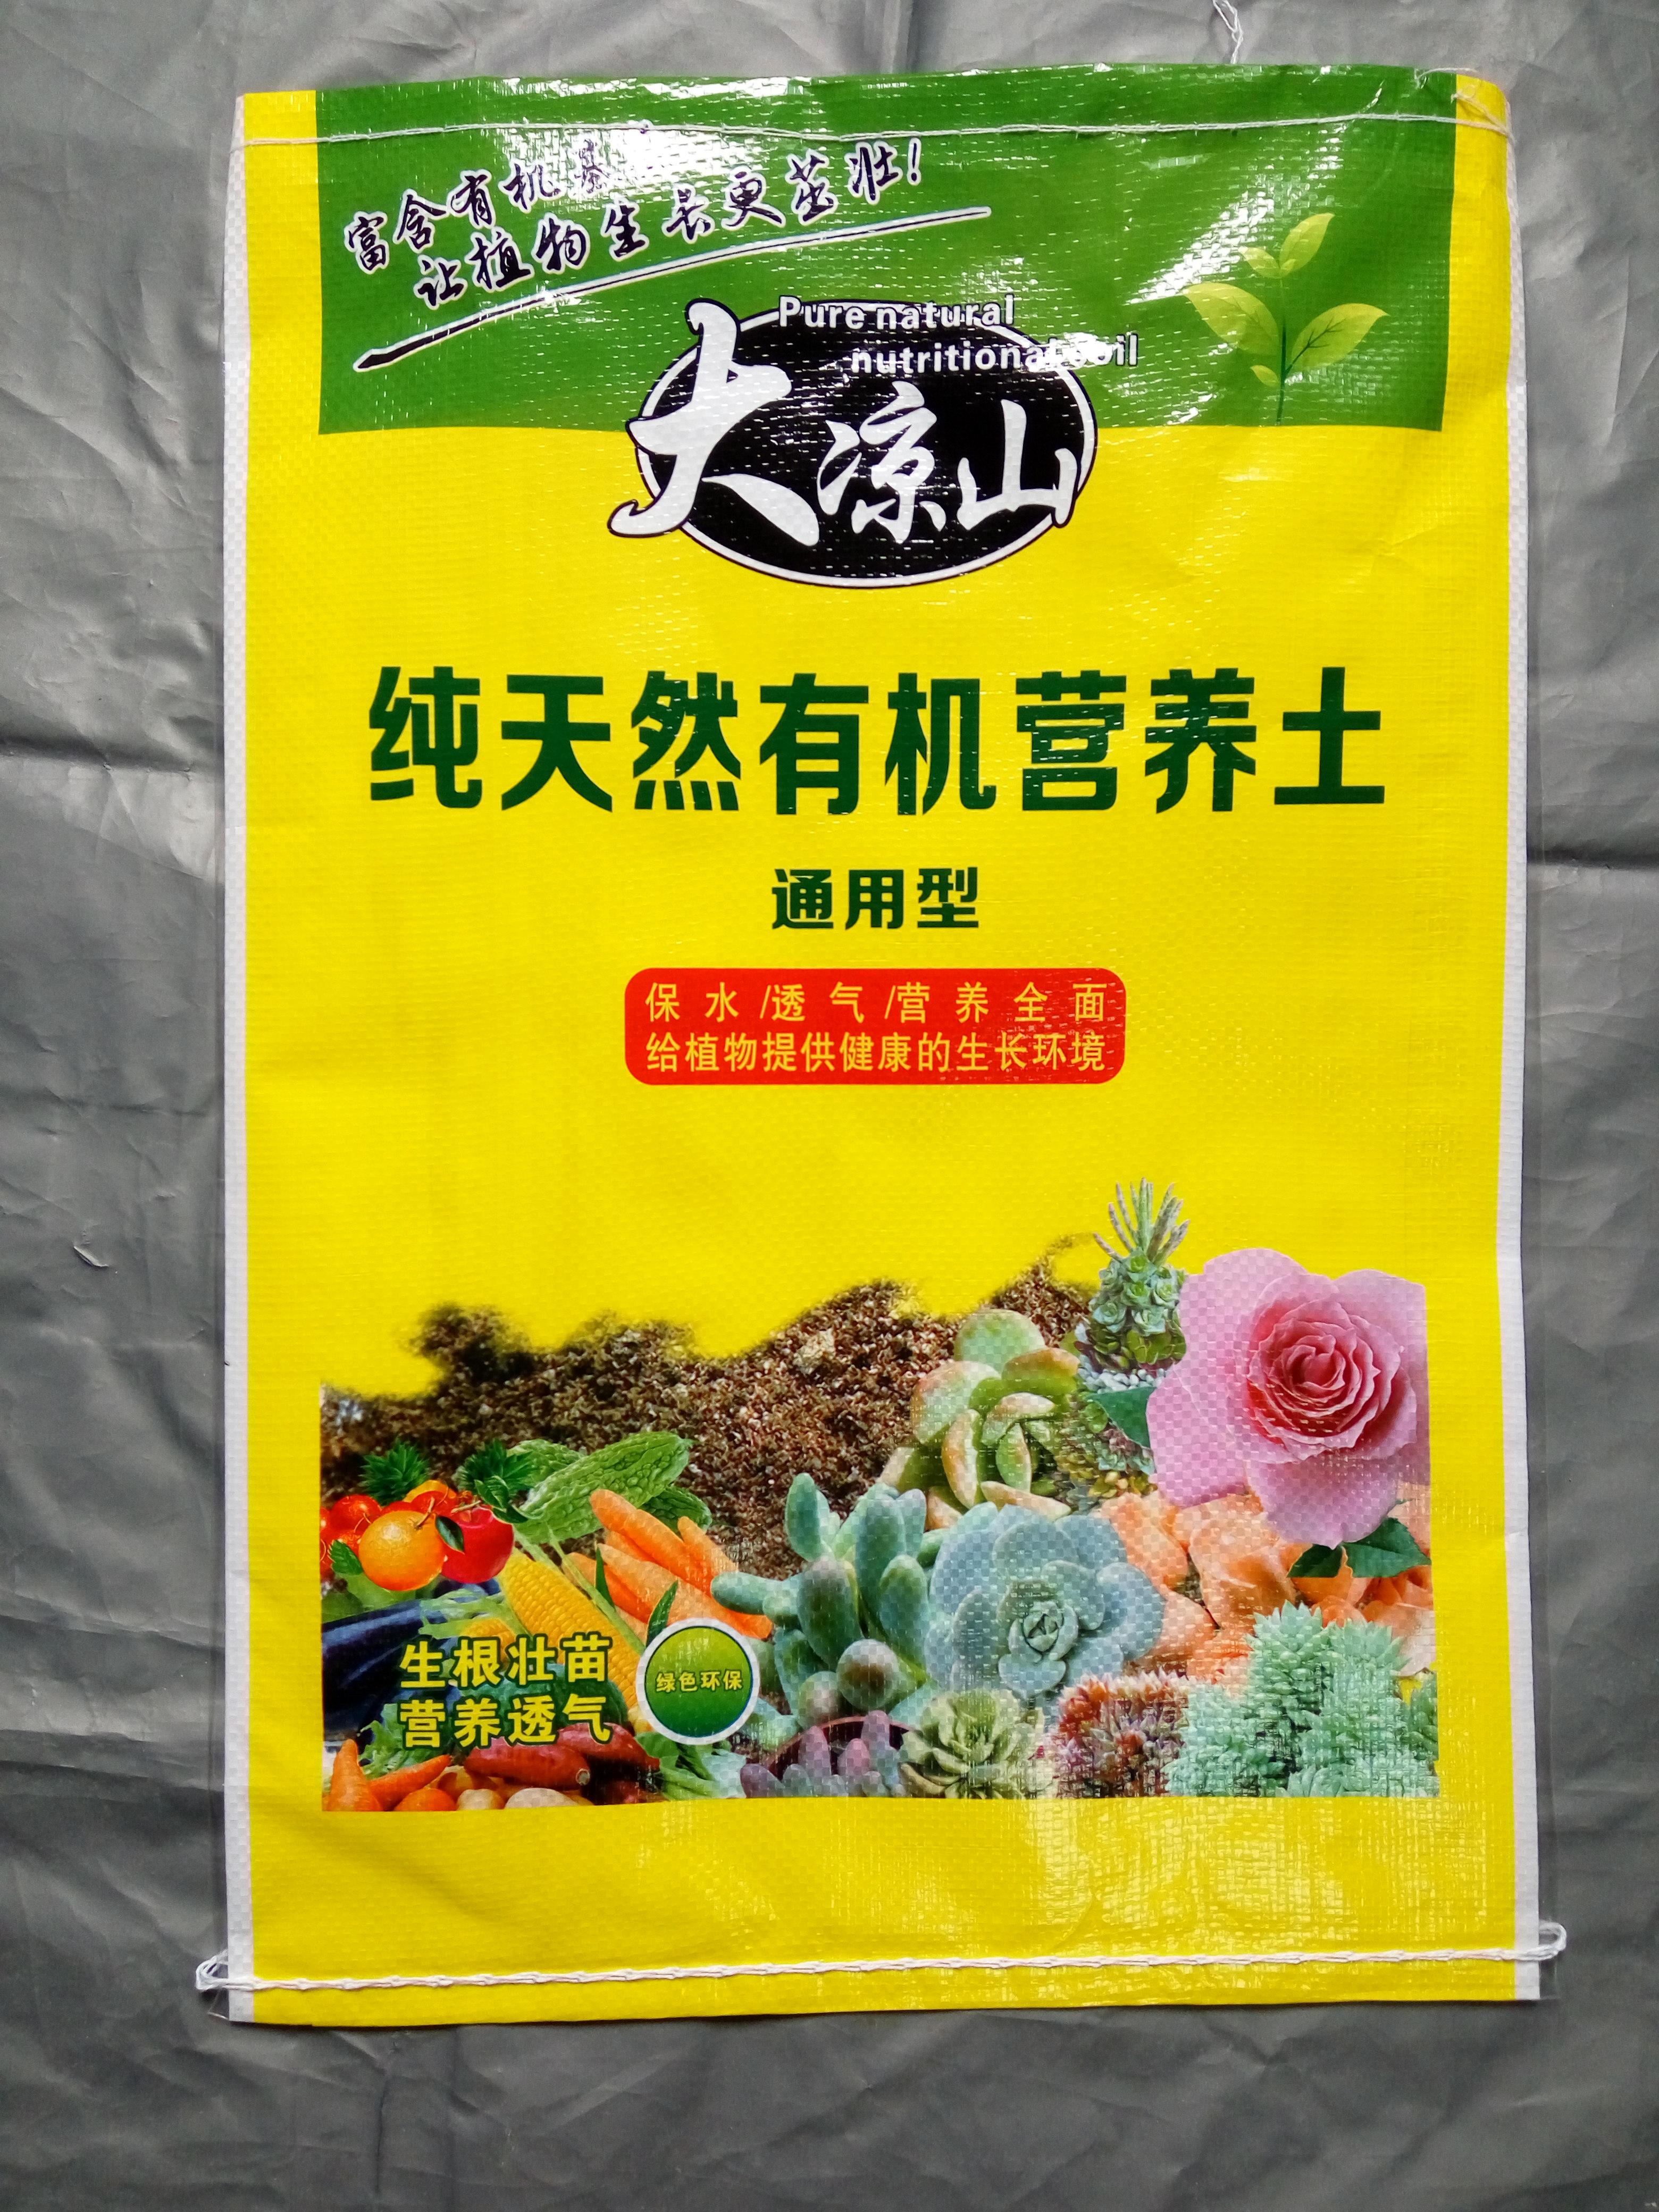 15kg营养土彩印编织袋营养土编织袋厂家营养土外包装袋价格成都